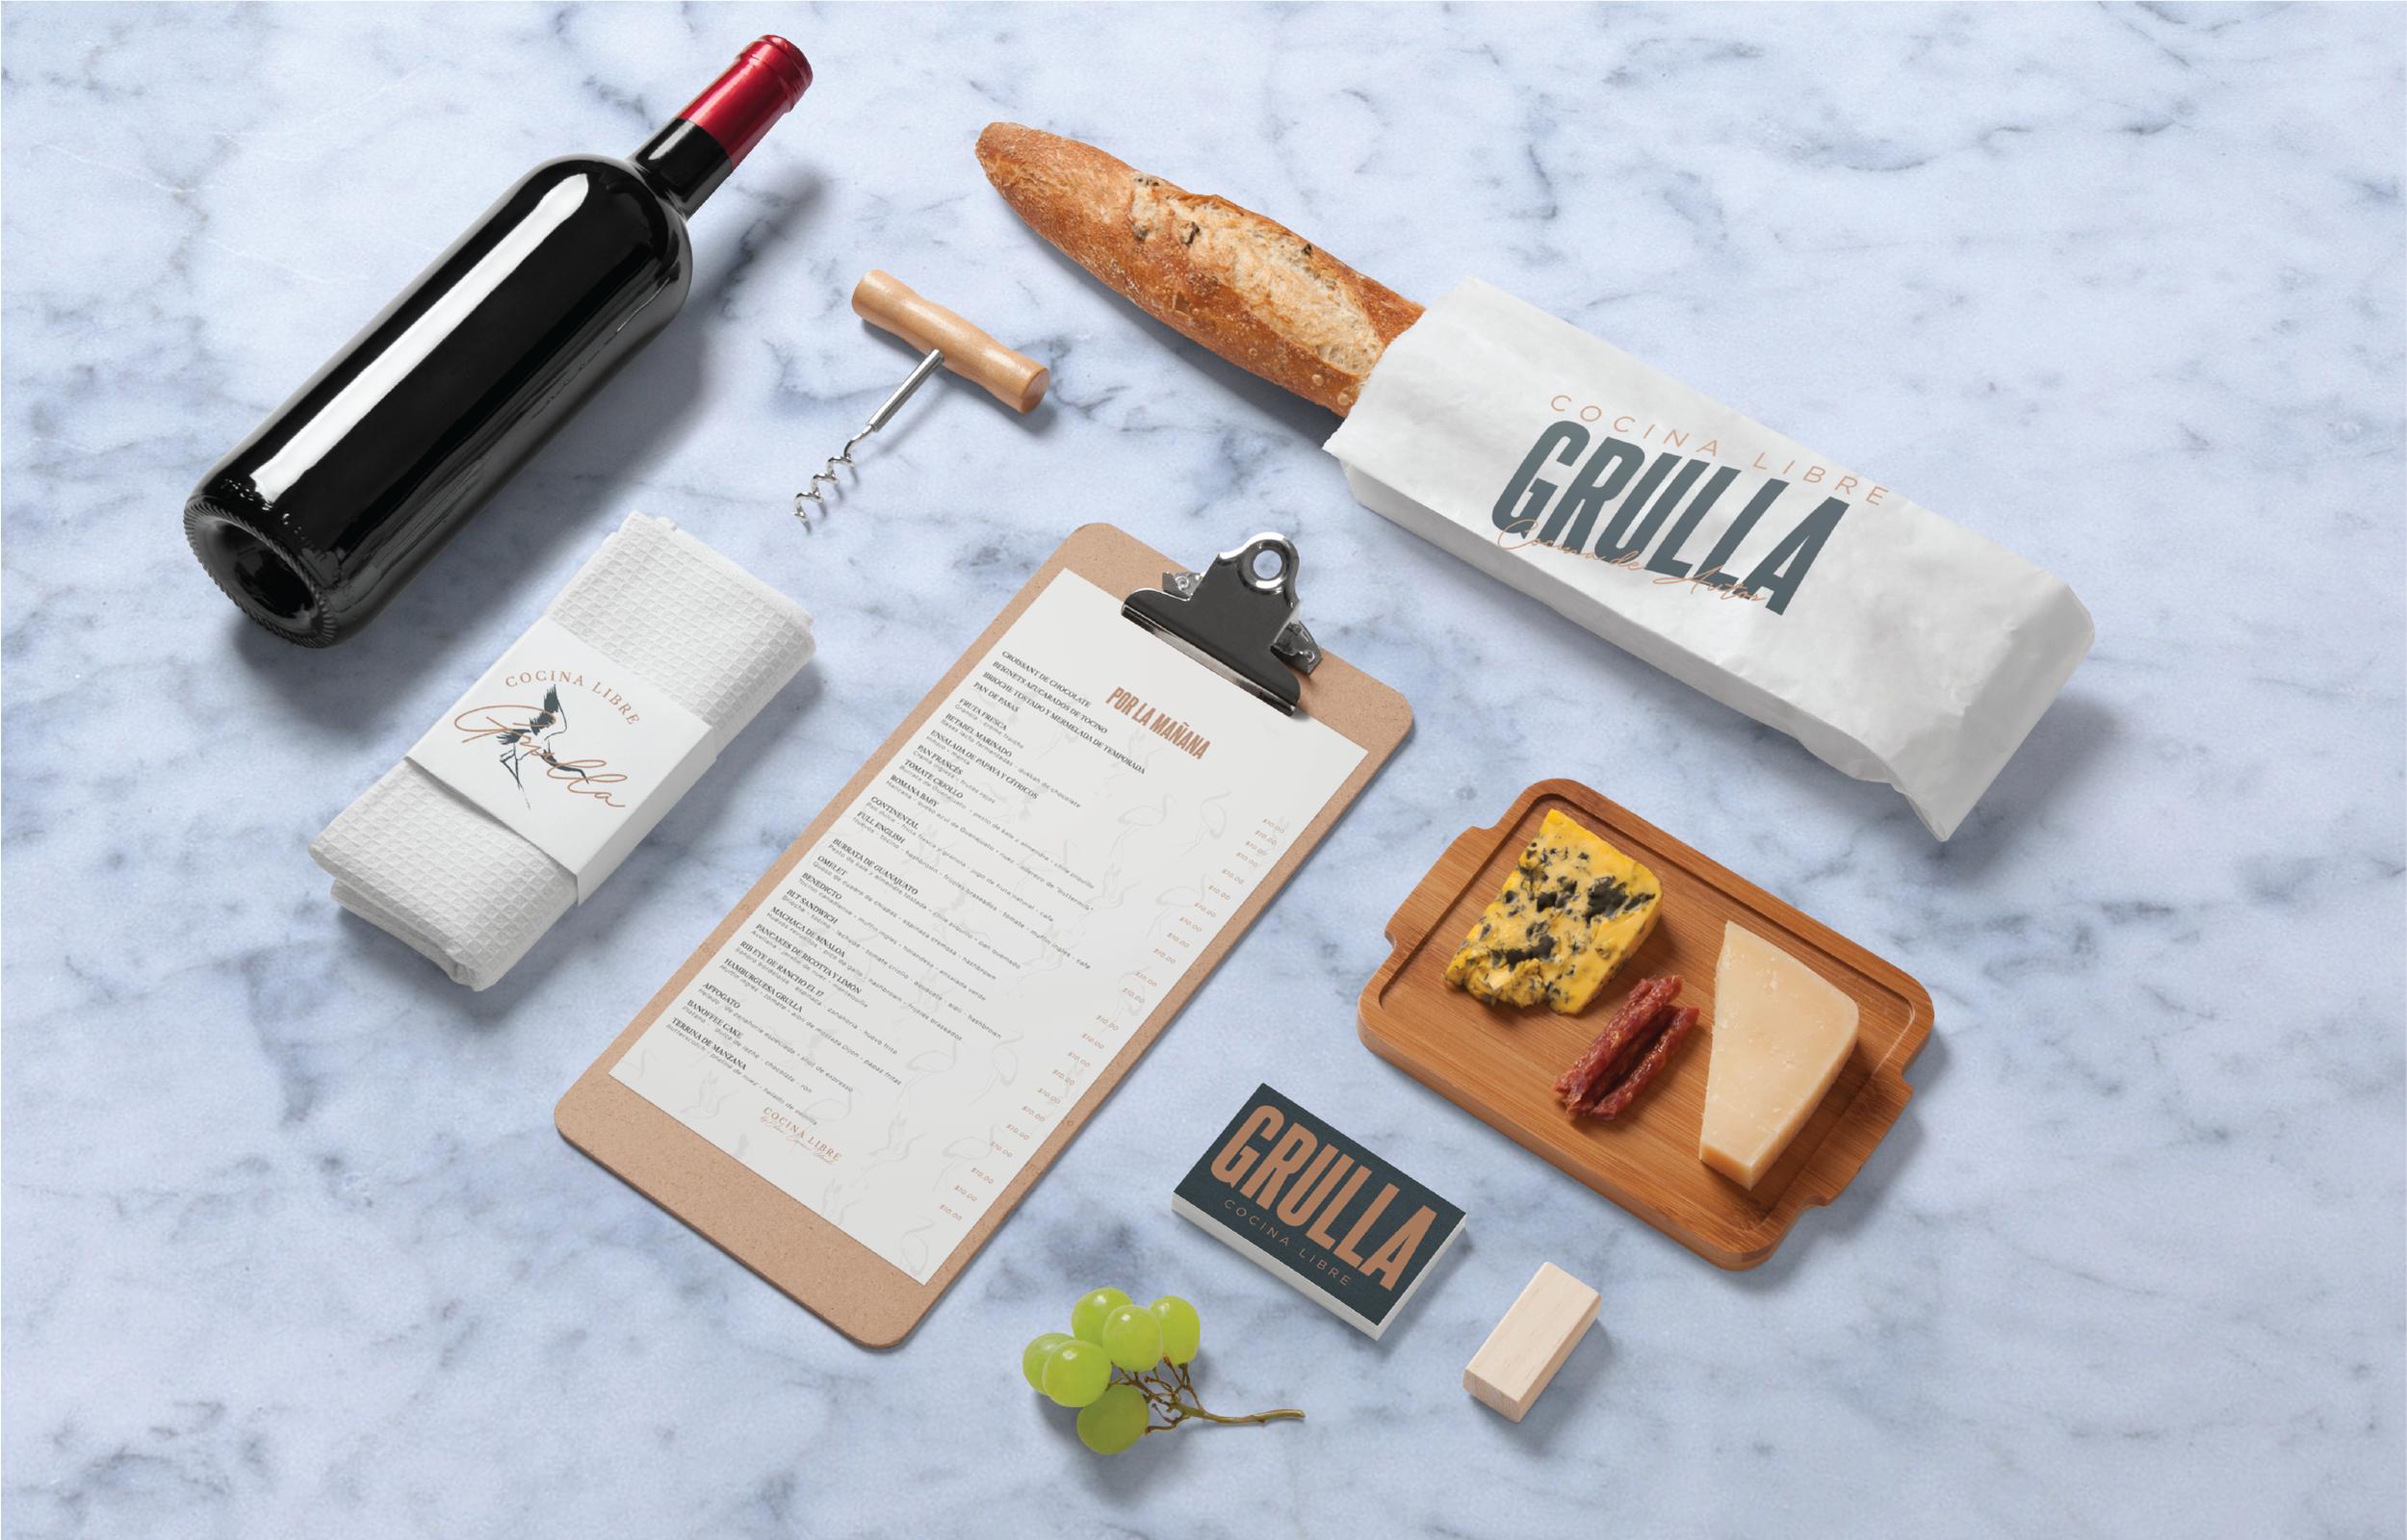 Grulla+Portafolio-12.png